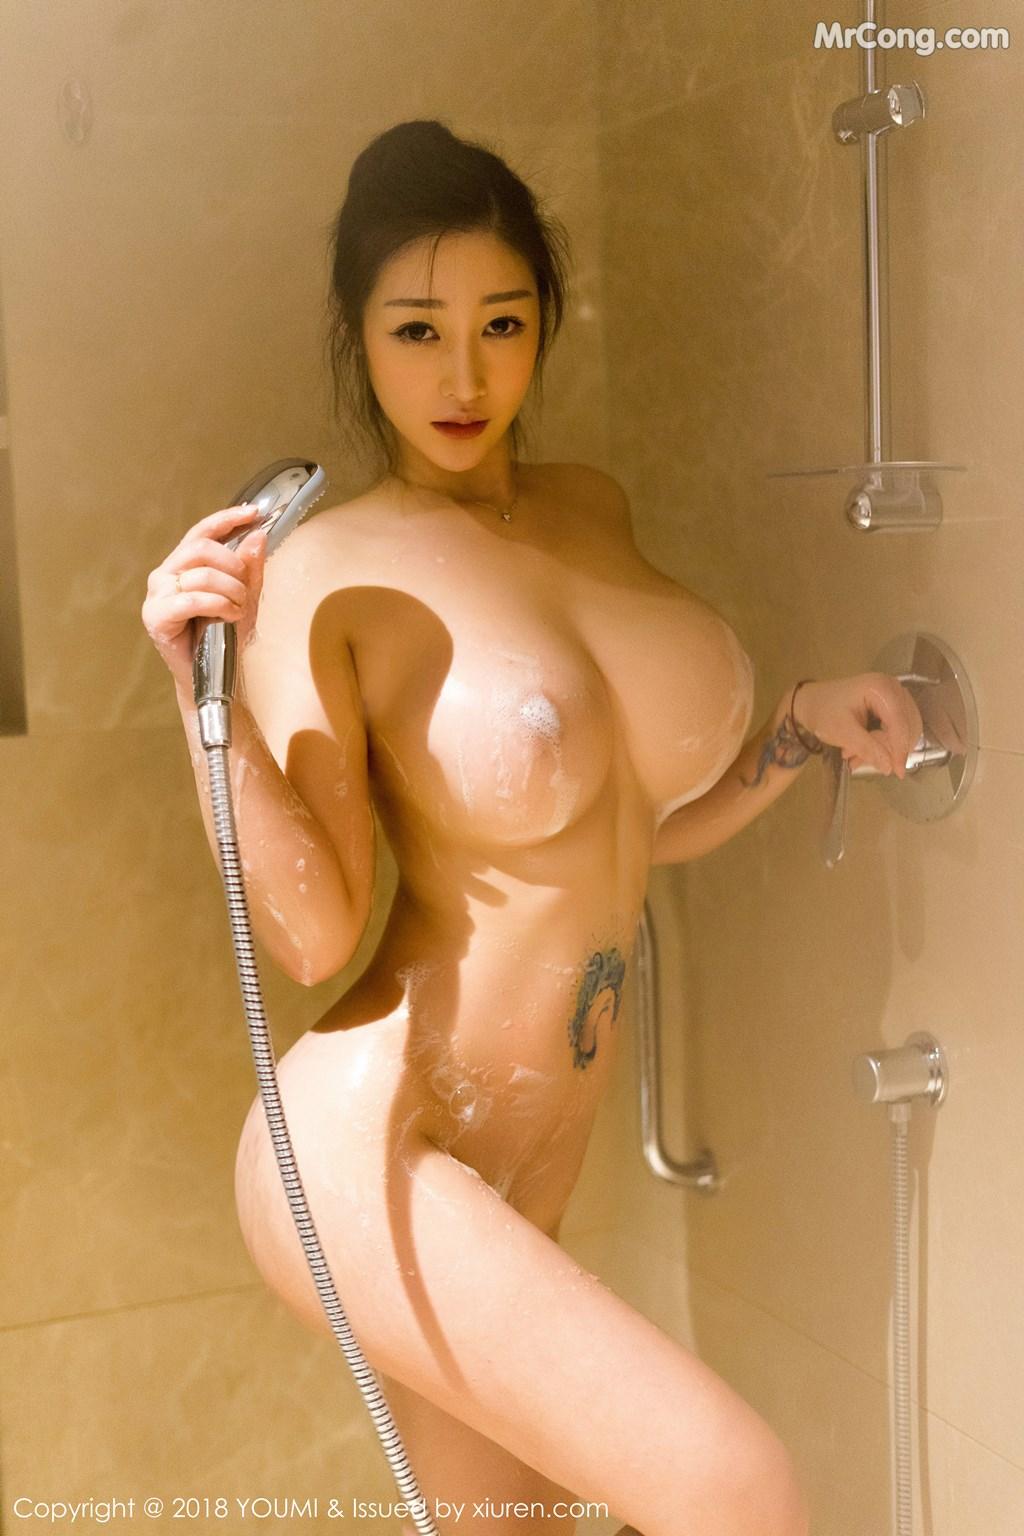 Image YouMi-Vol.119-Daji-Toxic-MrCong.com-028 in post YouMi Vol.119: Người mẫu Daji_Toxic (妲己_Toxic) (47 ảnh)